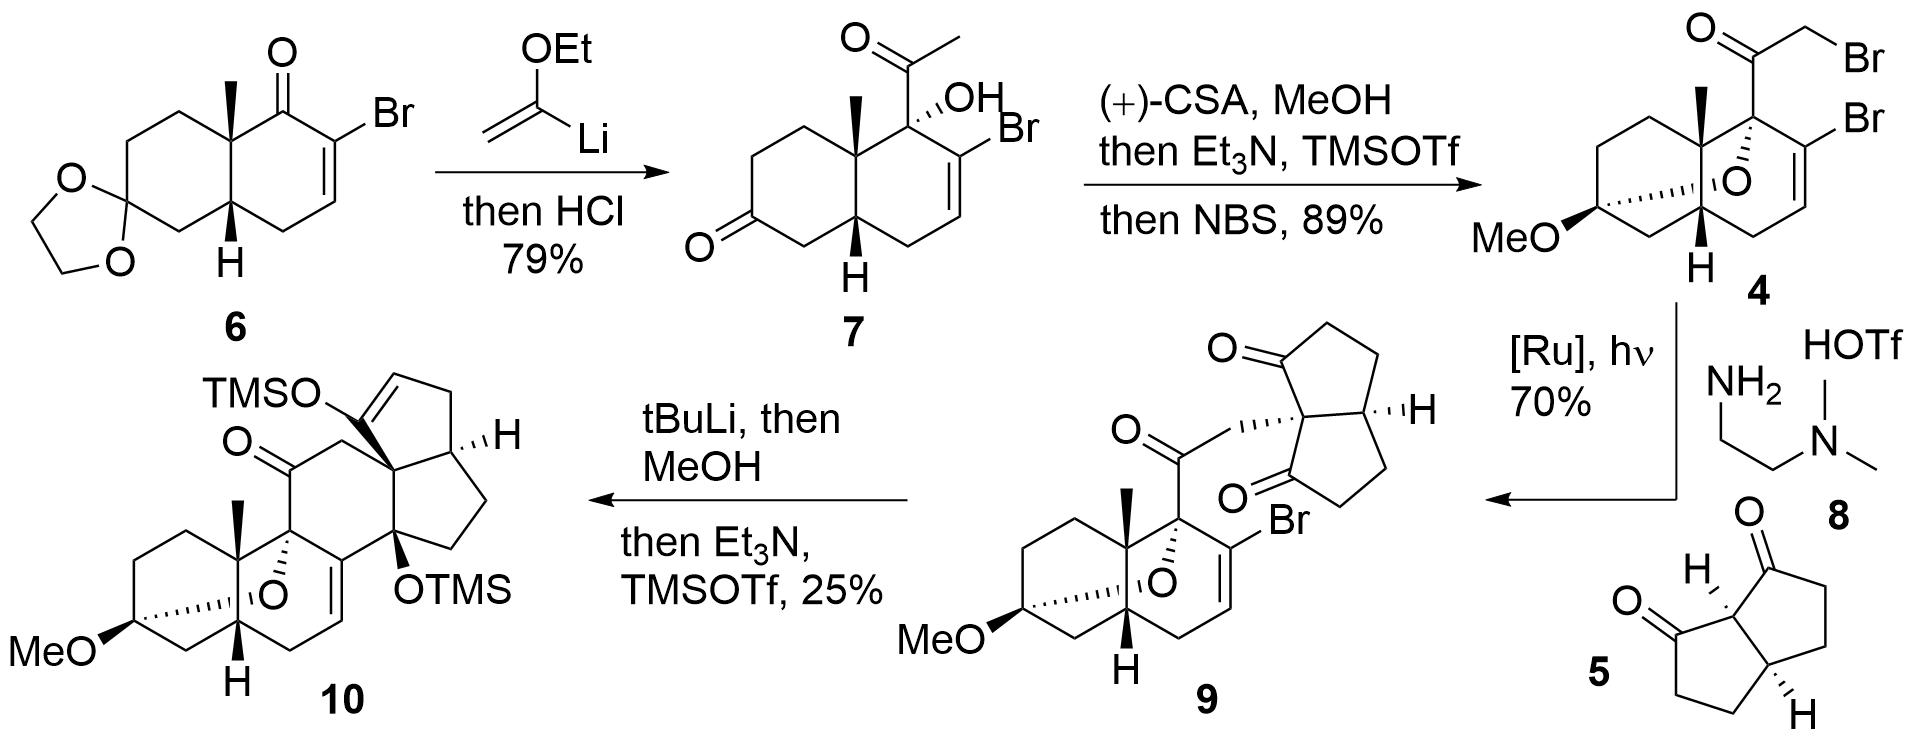 batrachotoxinin-2.png